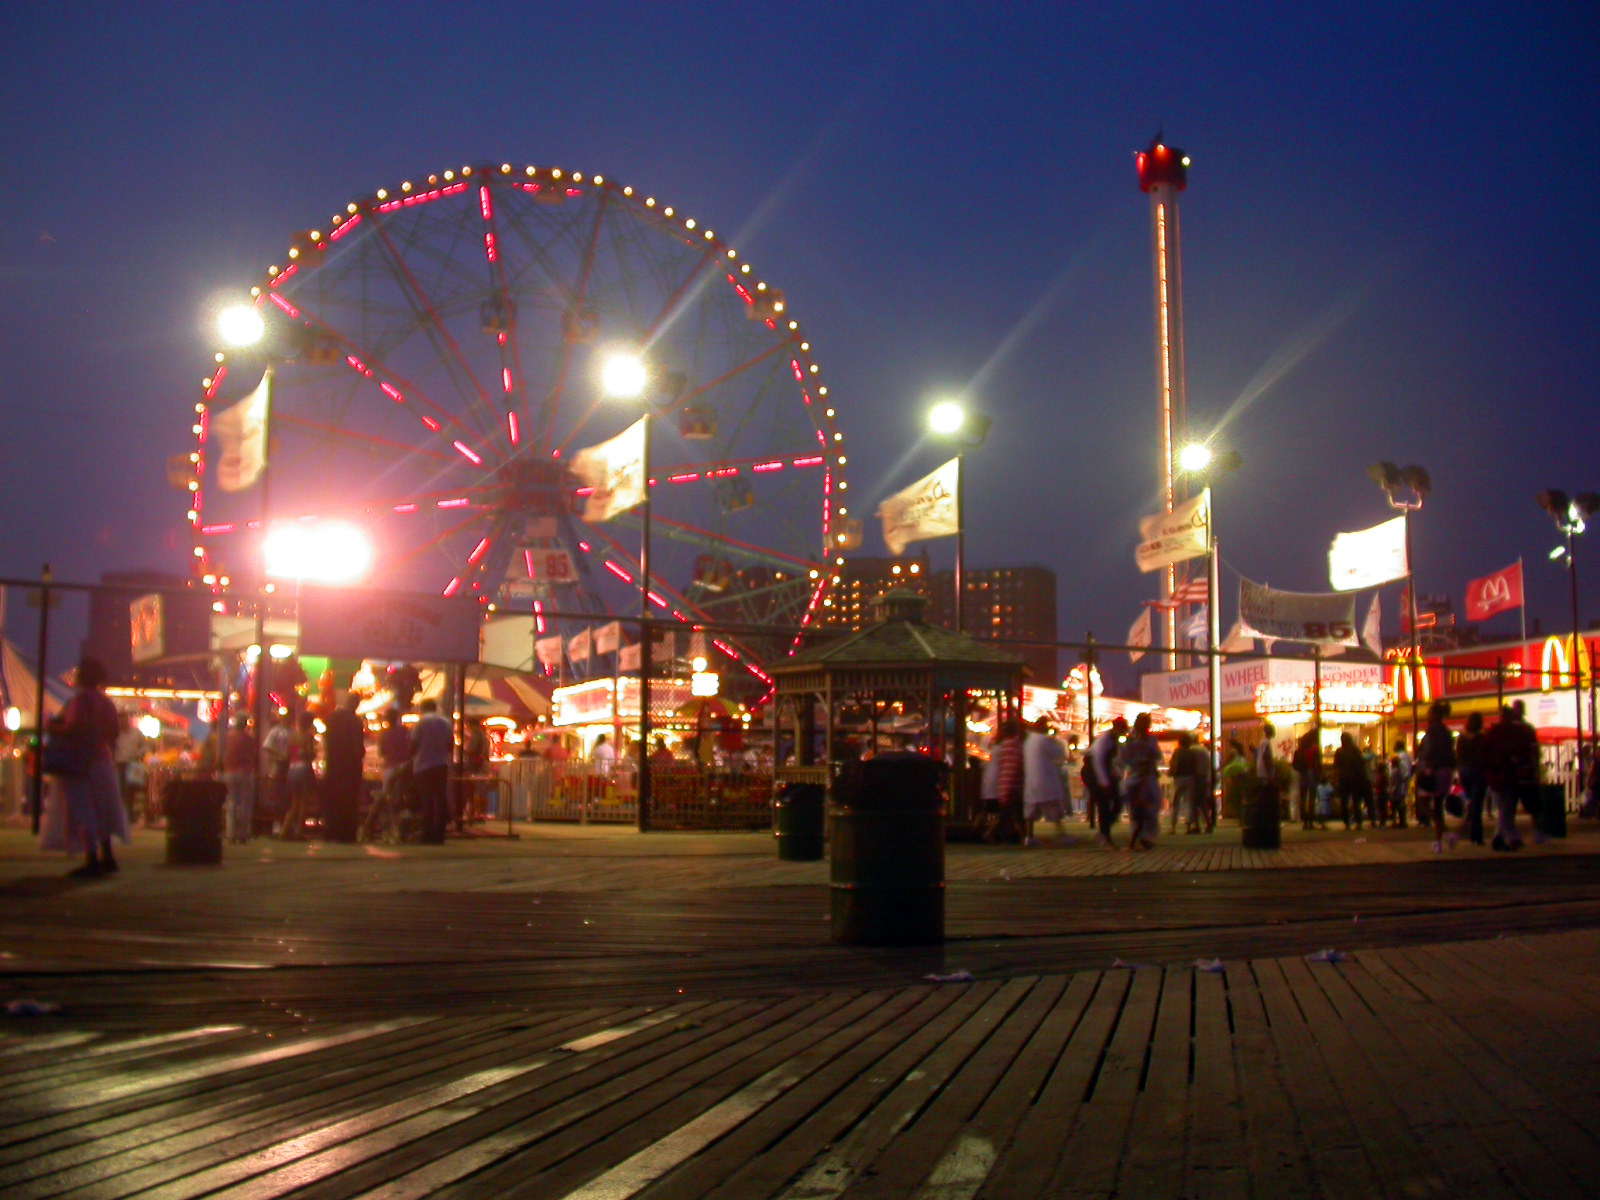 Astroland in a summer night, 2005